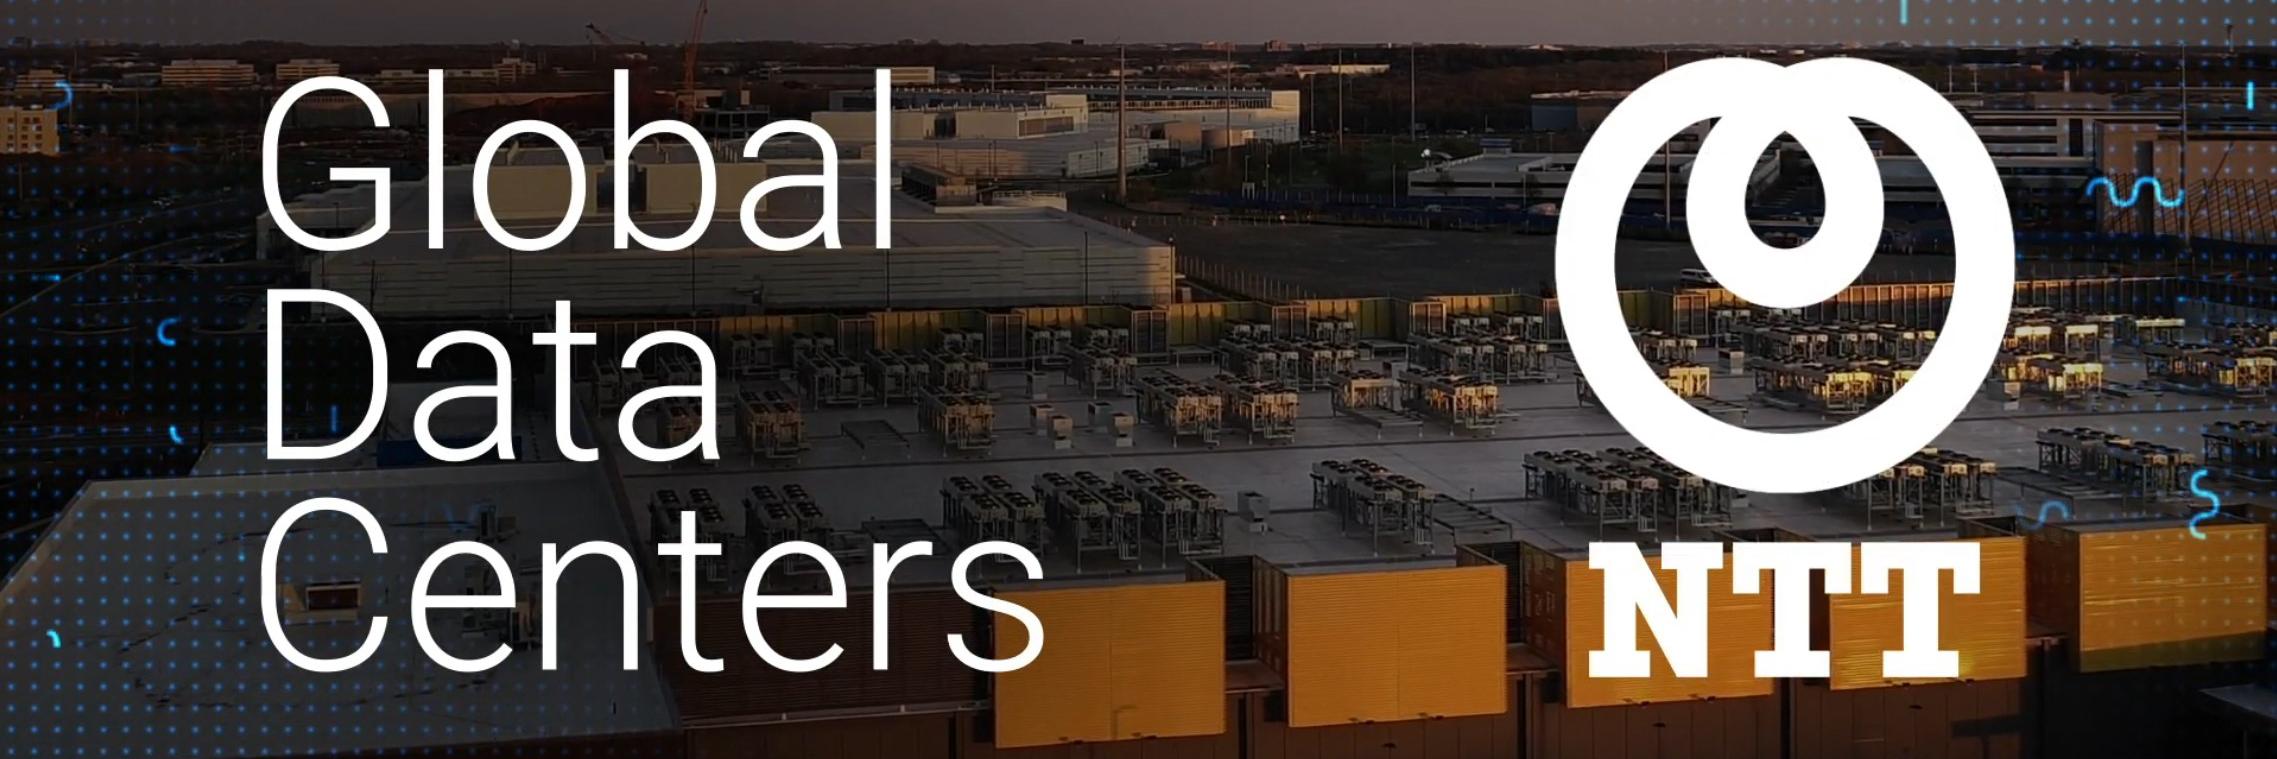 NTT Global Data Centers EMEA GmbH